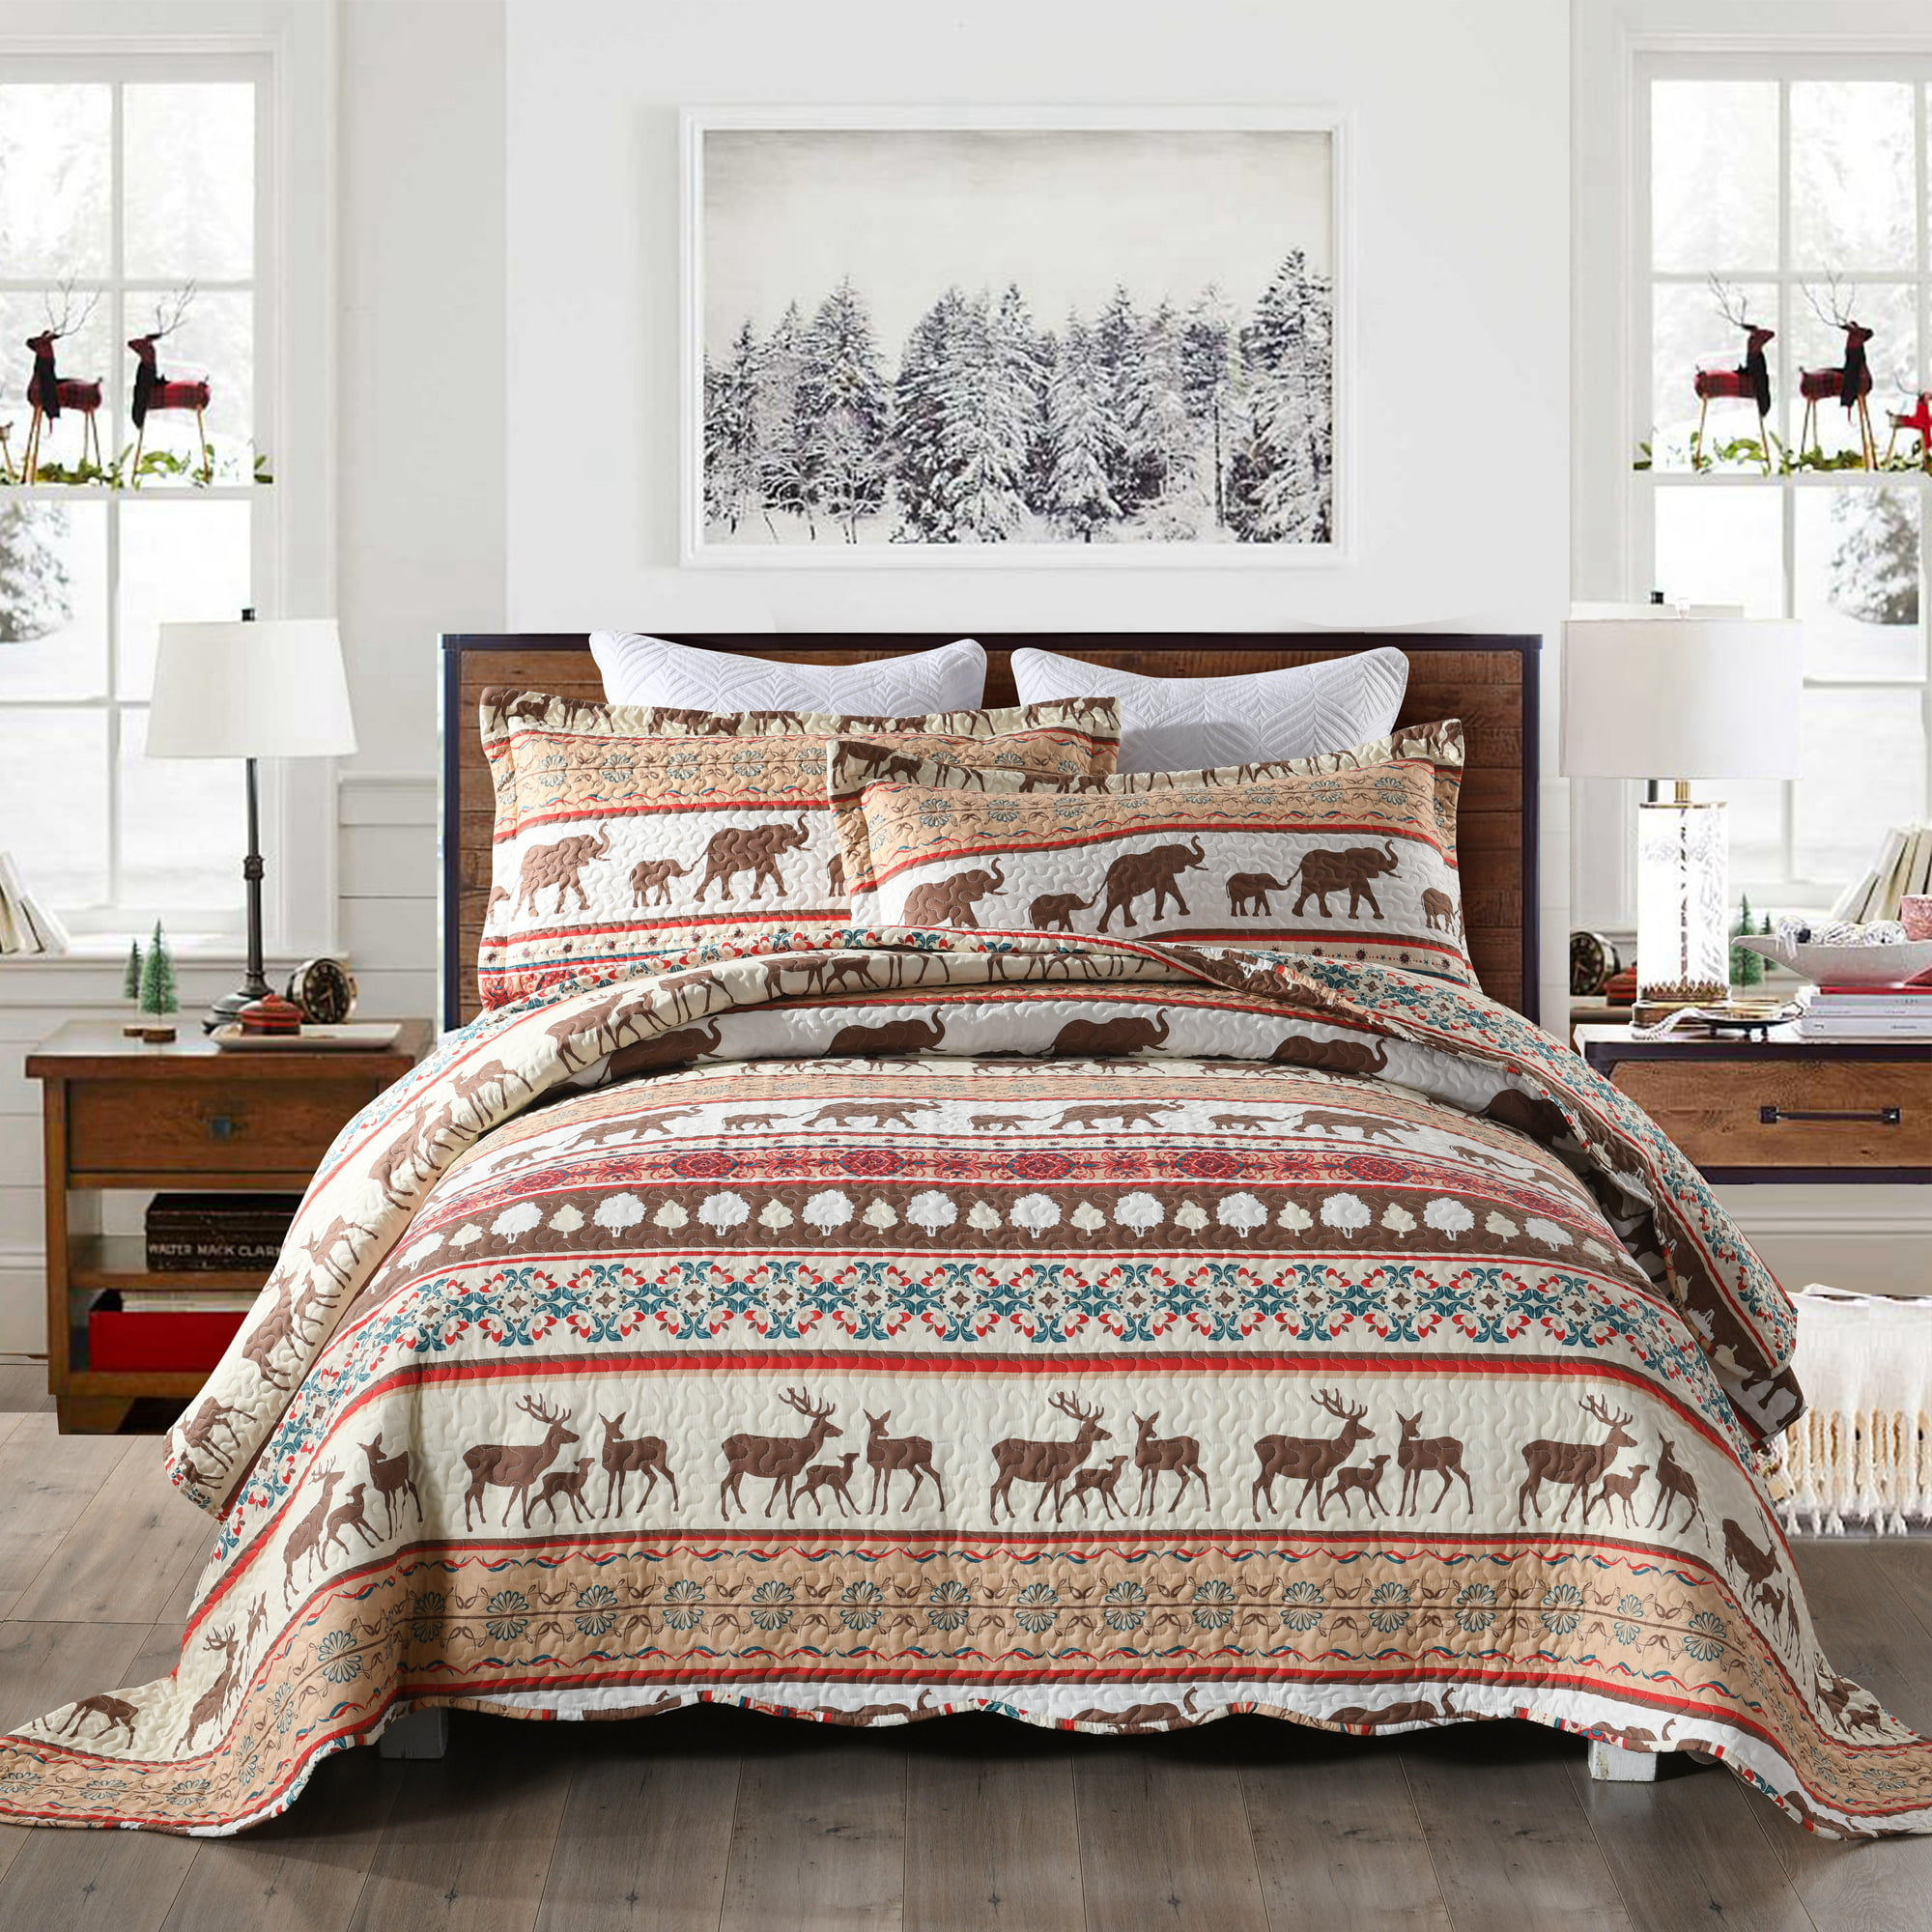 Christmas Rustic Lodge Deer Cotton Reversible Quilt Set Coverlet Bedspread